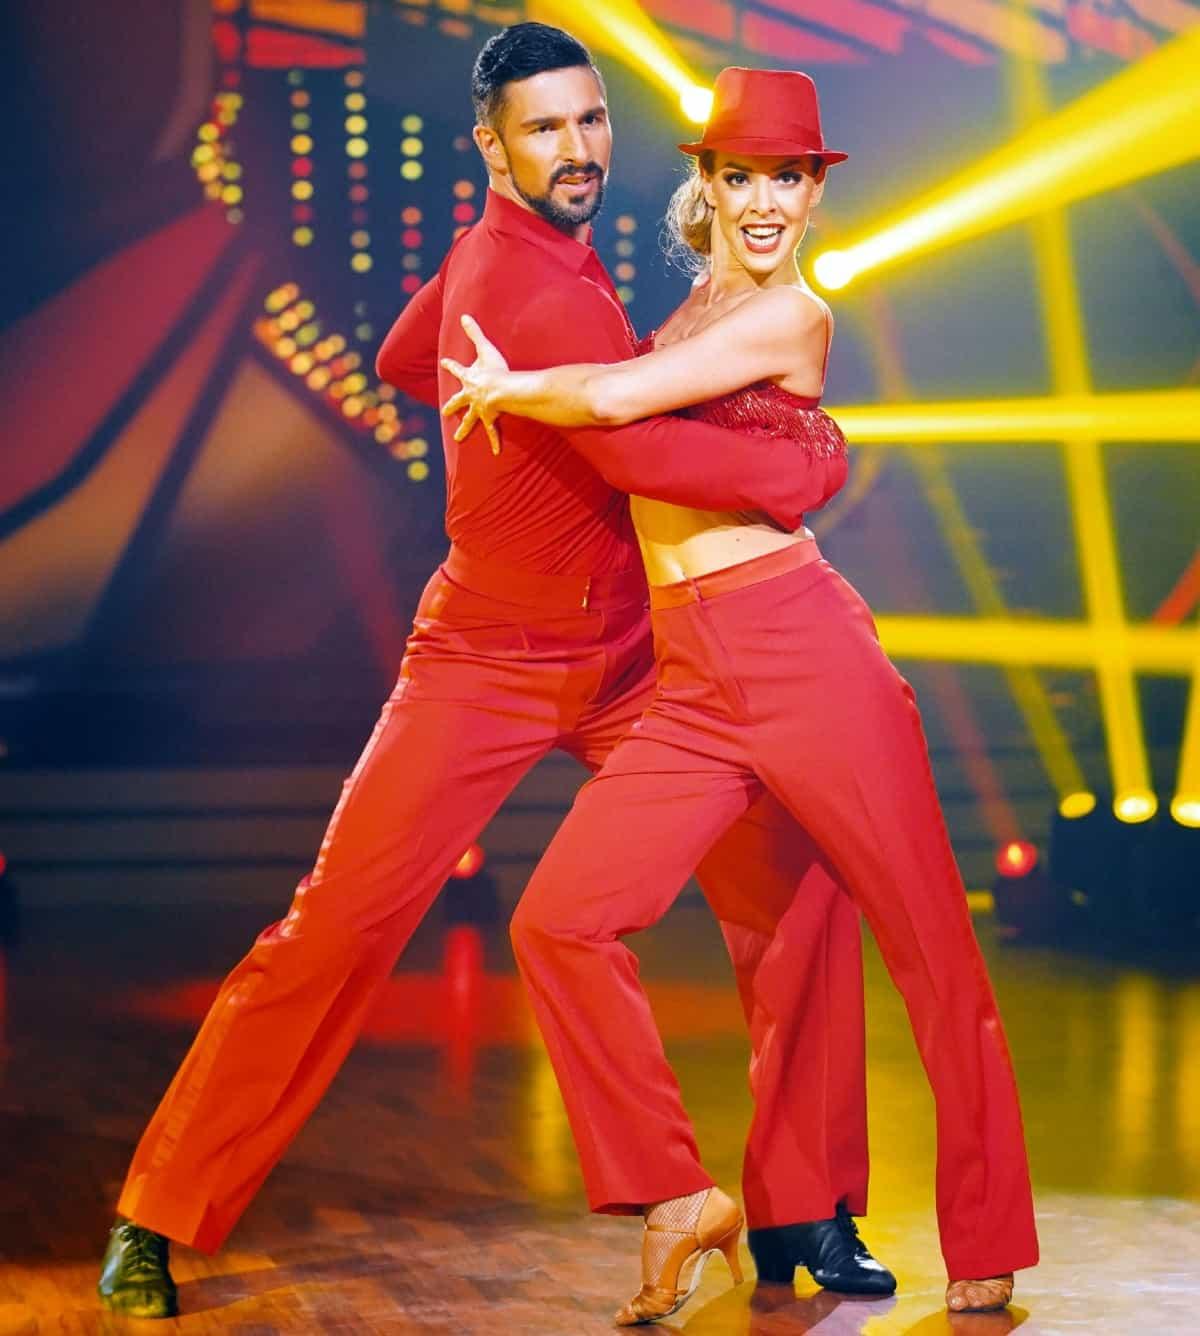 Platz 3 Let's dance 2019 Benjamin Piwko - Isabel Edvardsson